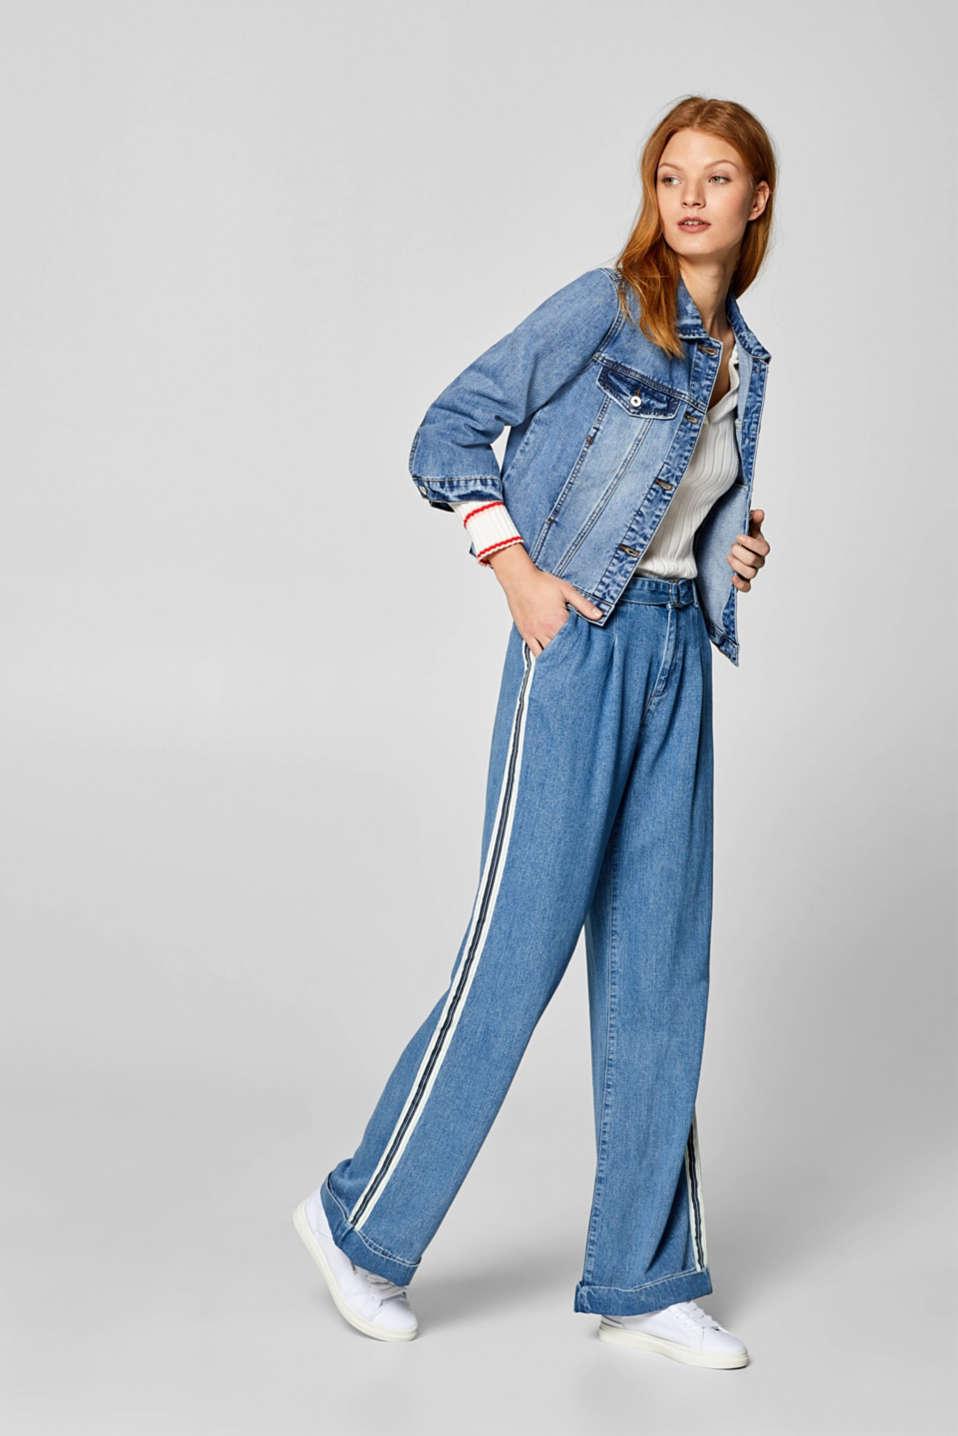 Jackets indoor woven, BLUE MEDIUM WASH, detail image number 1